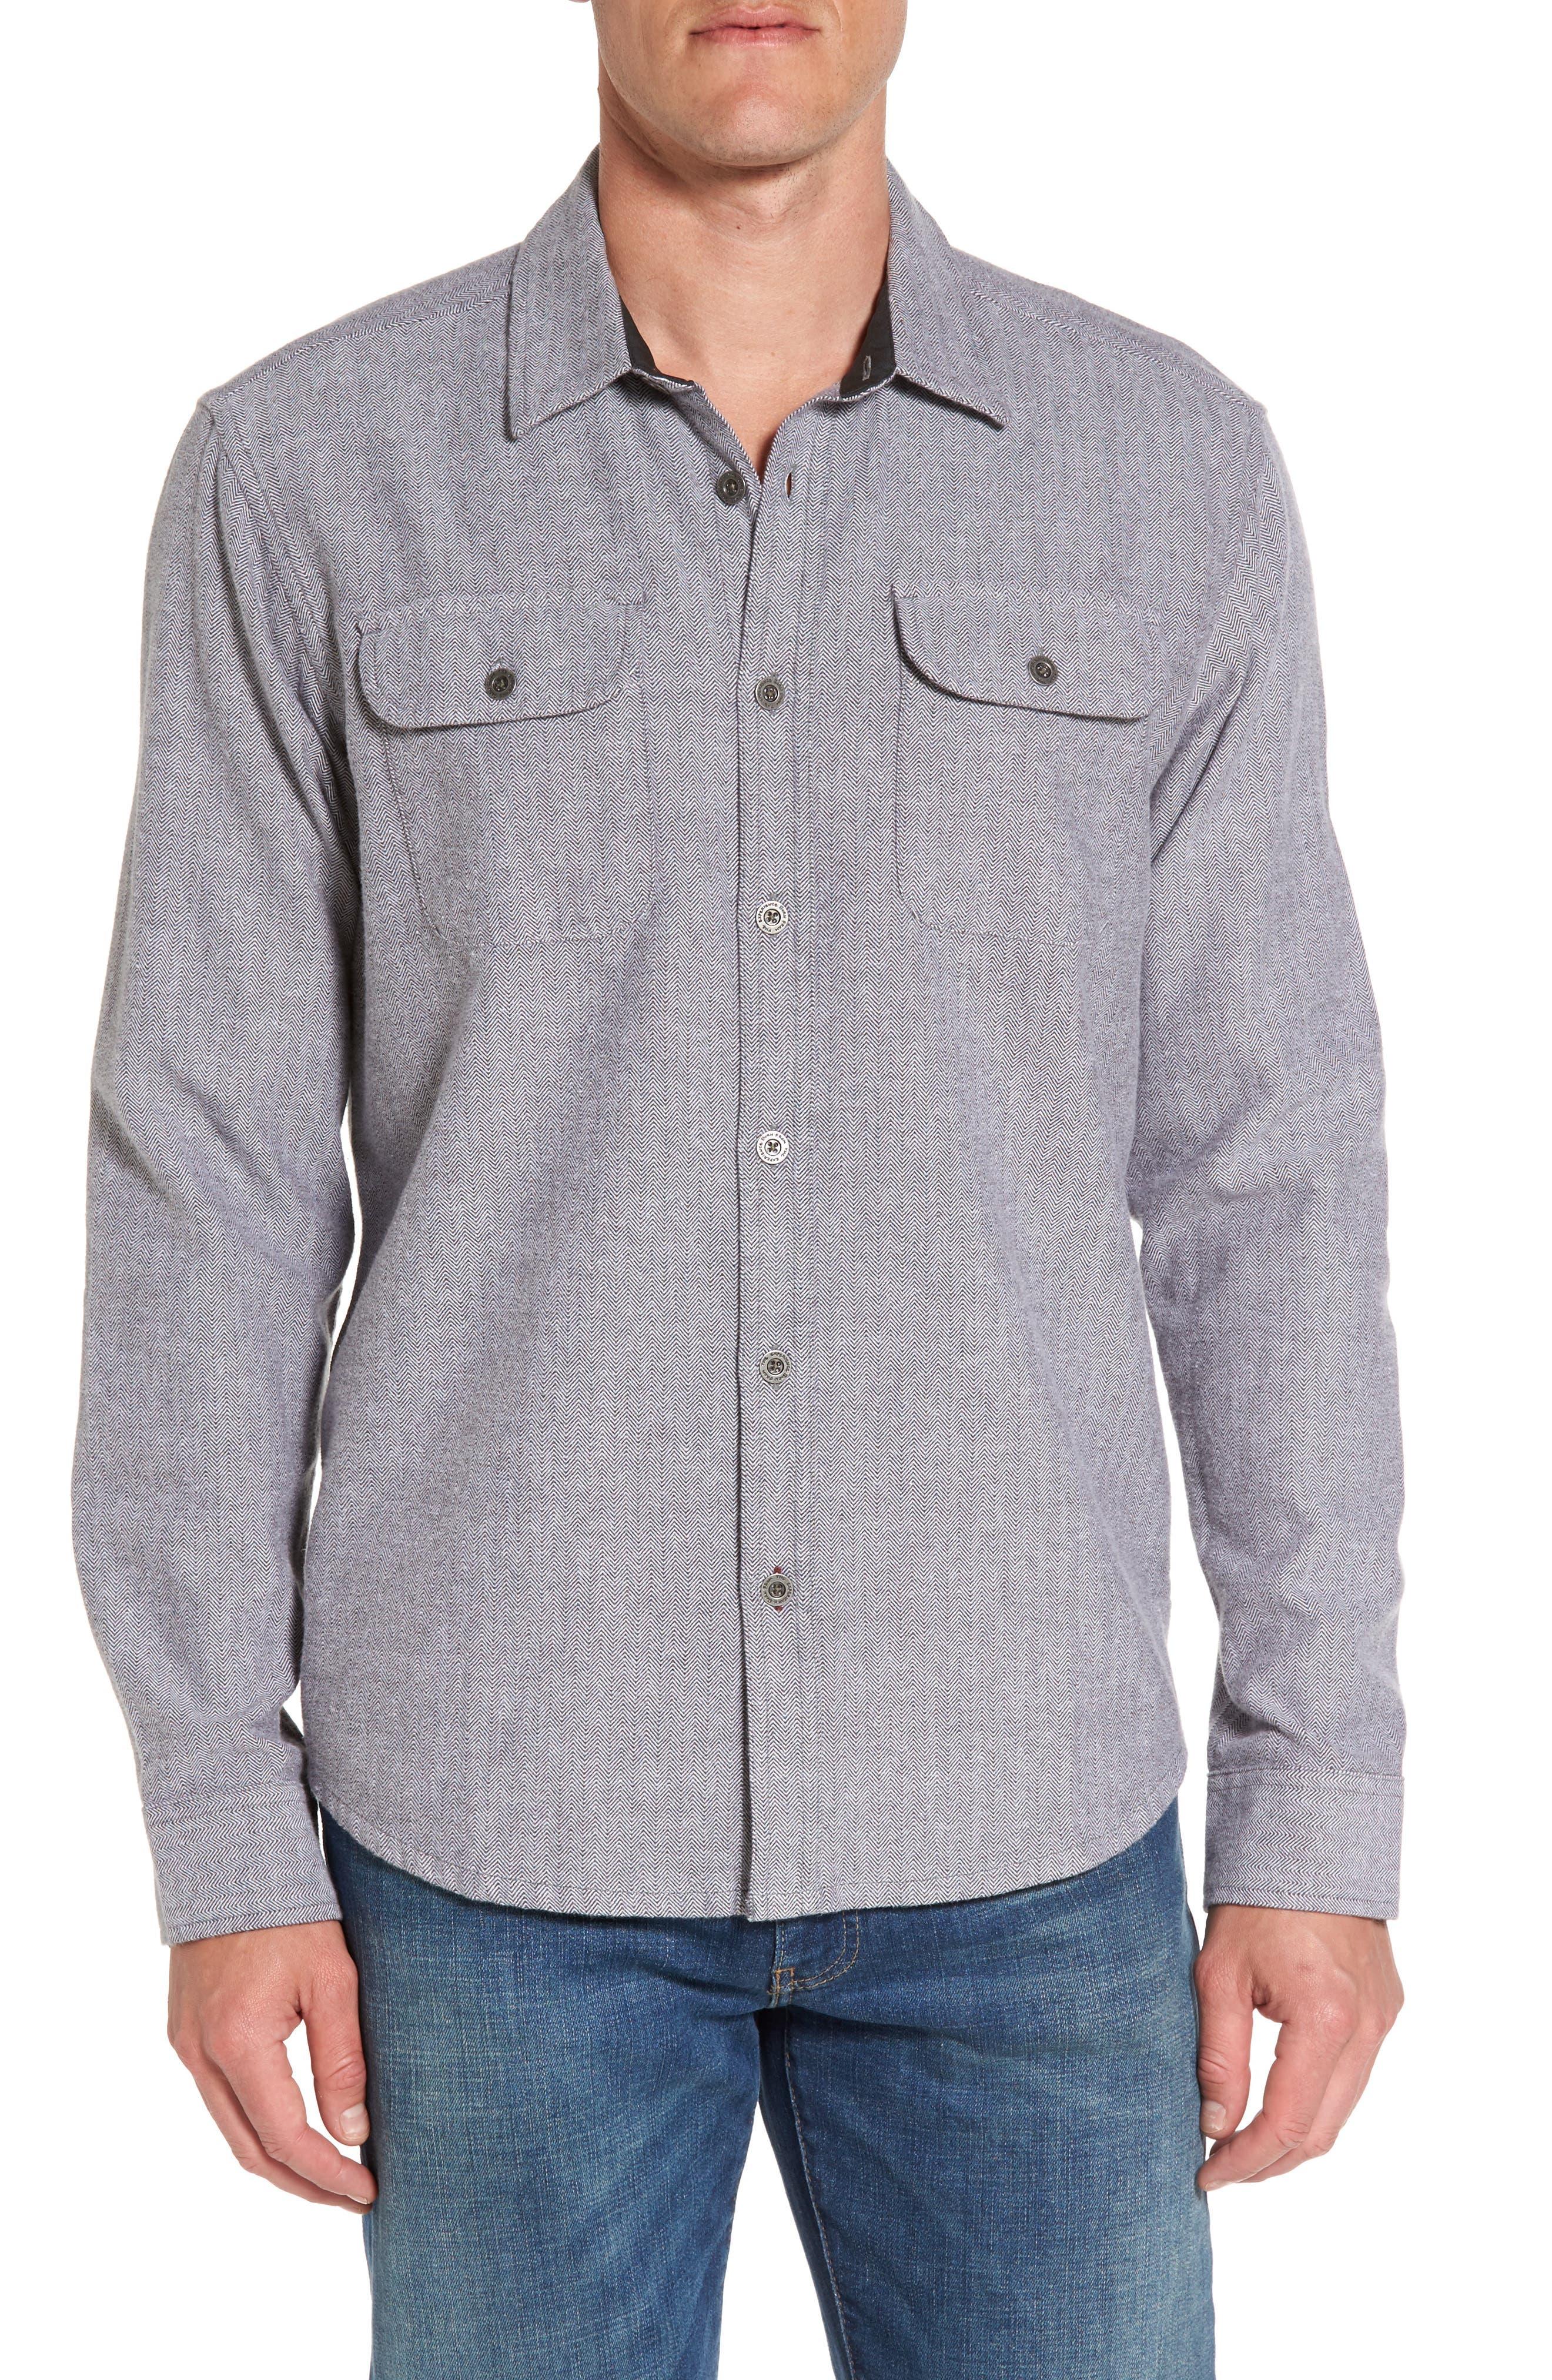 Main Image - prAna Lybek Regular Fit Herringbone Flannel Shirt